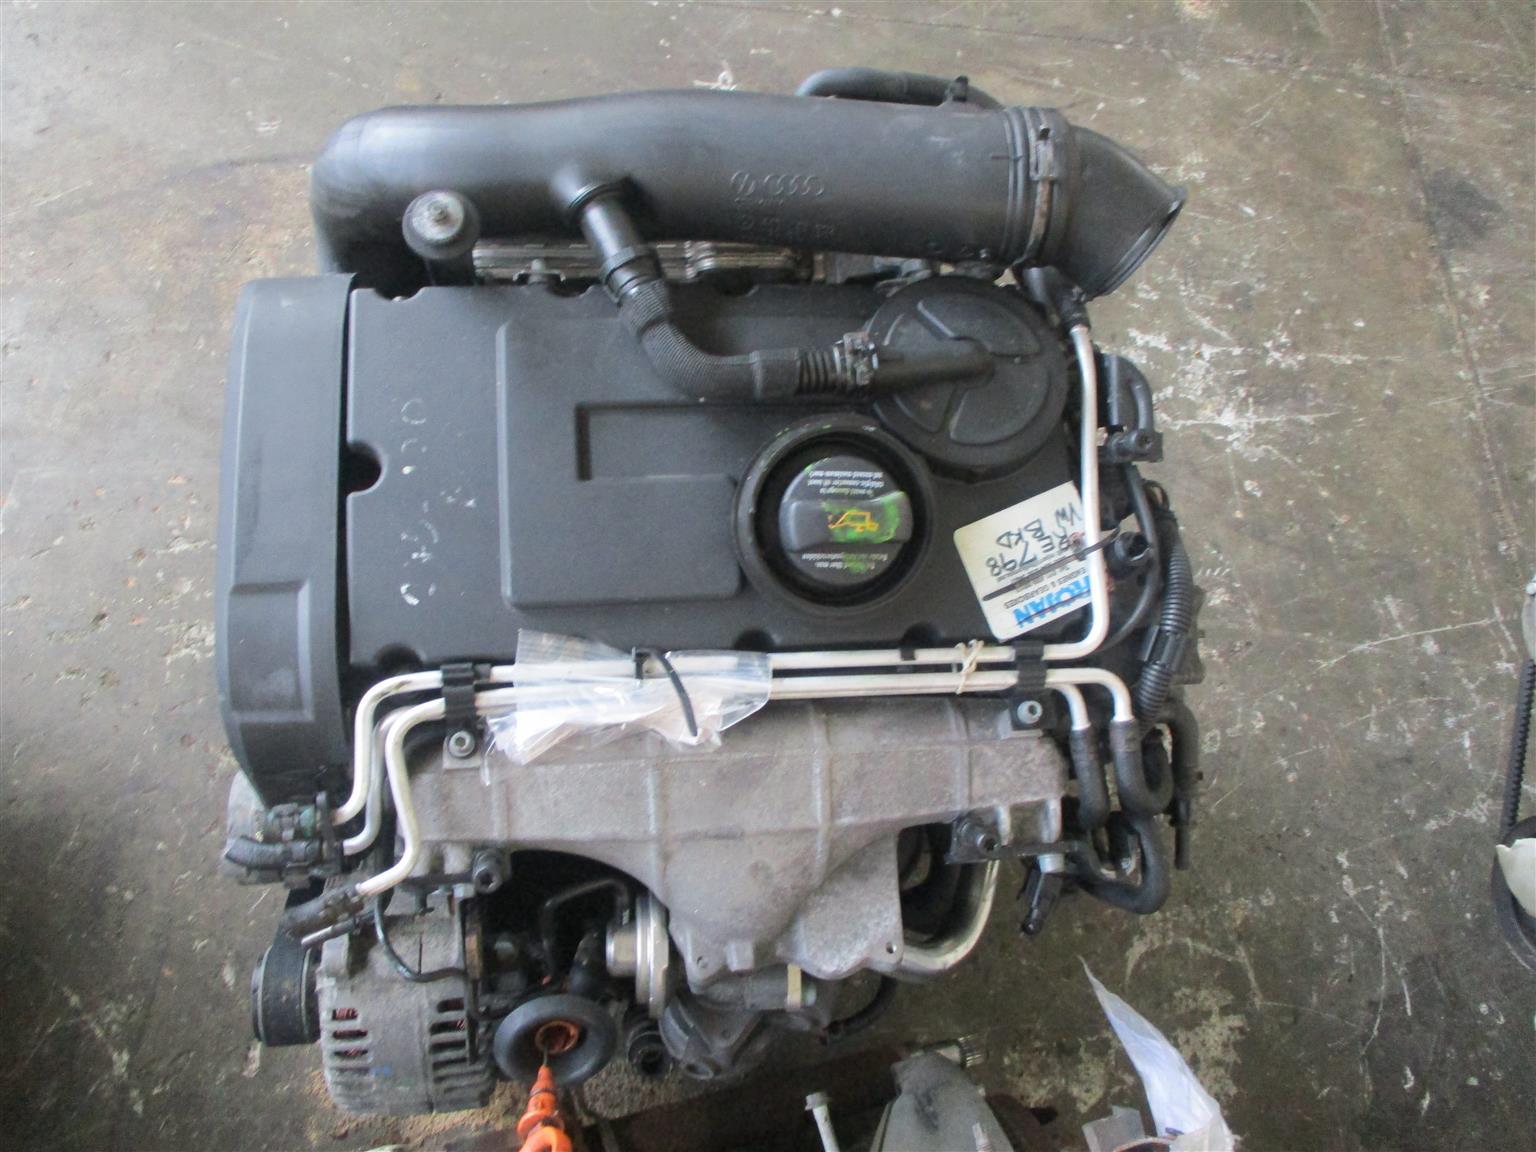 VW Passat 2 0TDi (BKP) engine for sale